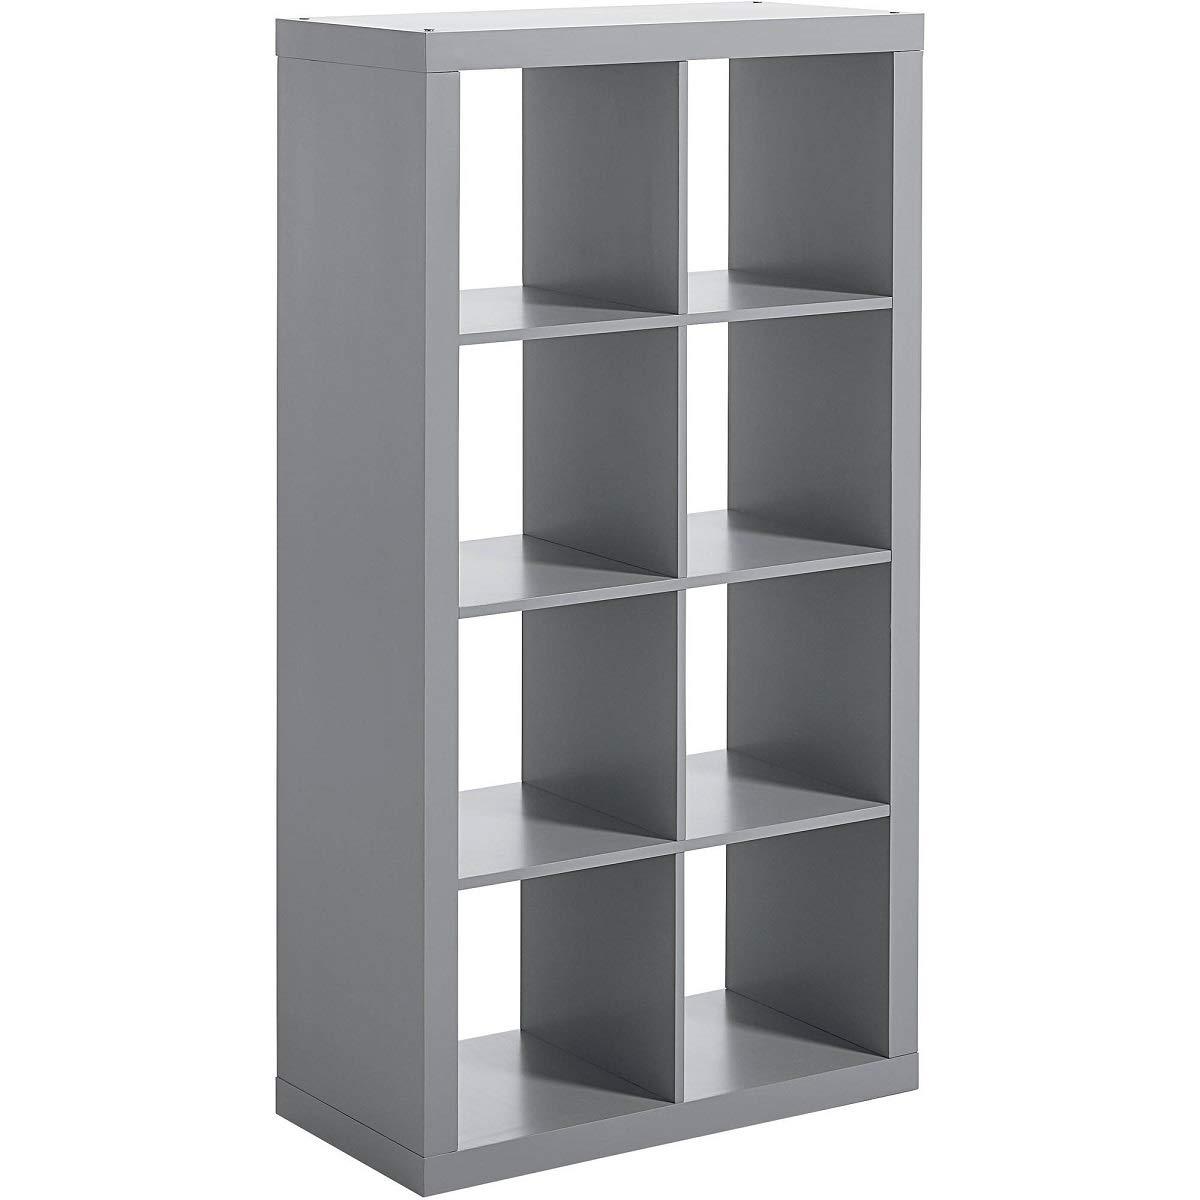 Versatile Indoor Decor 12 Cube Storage Organizer with Toilet Bowl Better Homes /& Gardens Stylistic Espresso